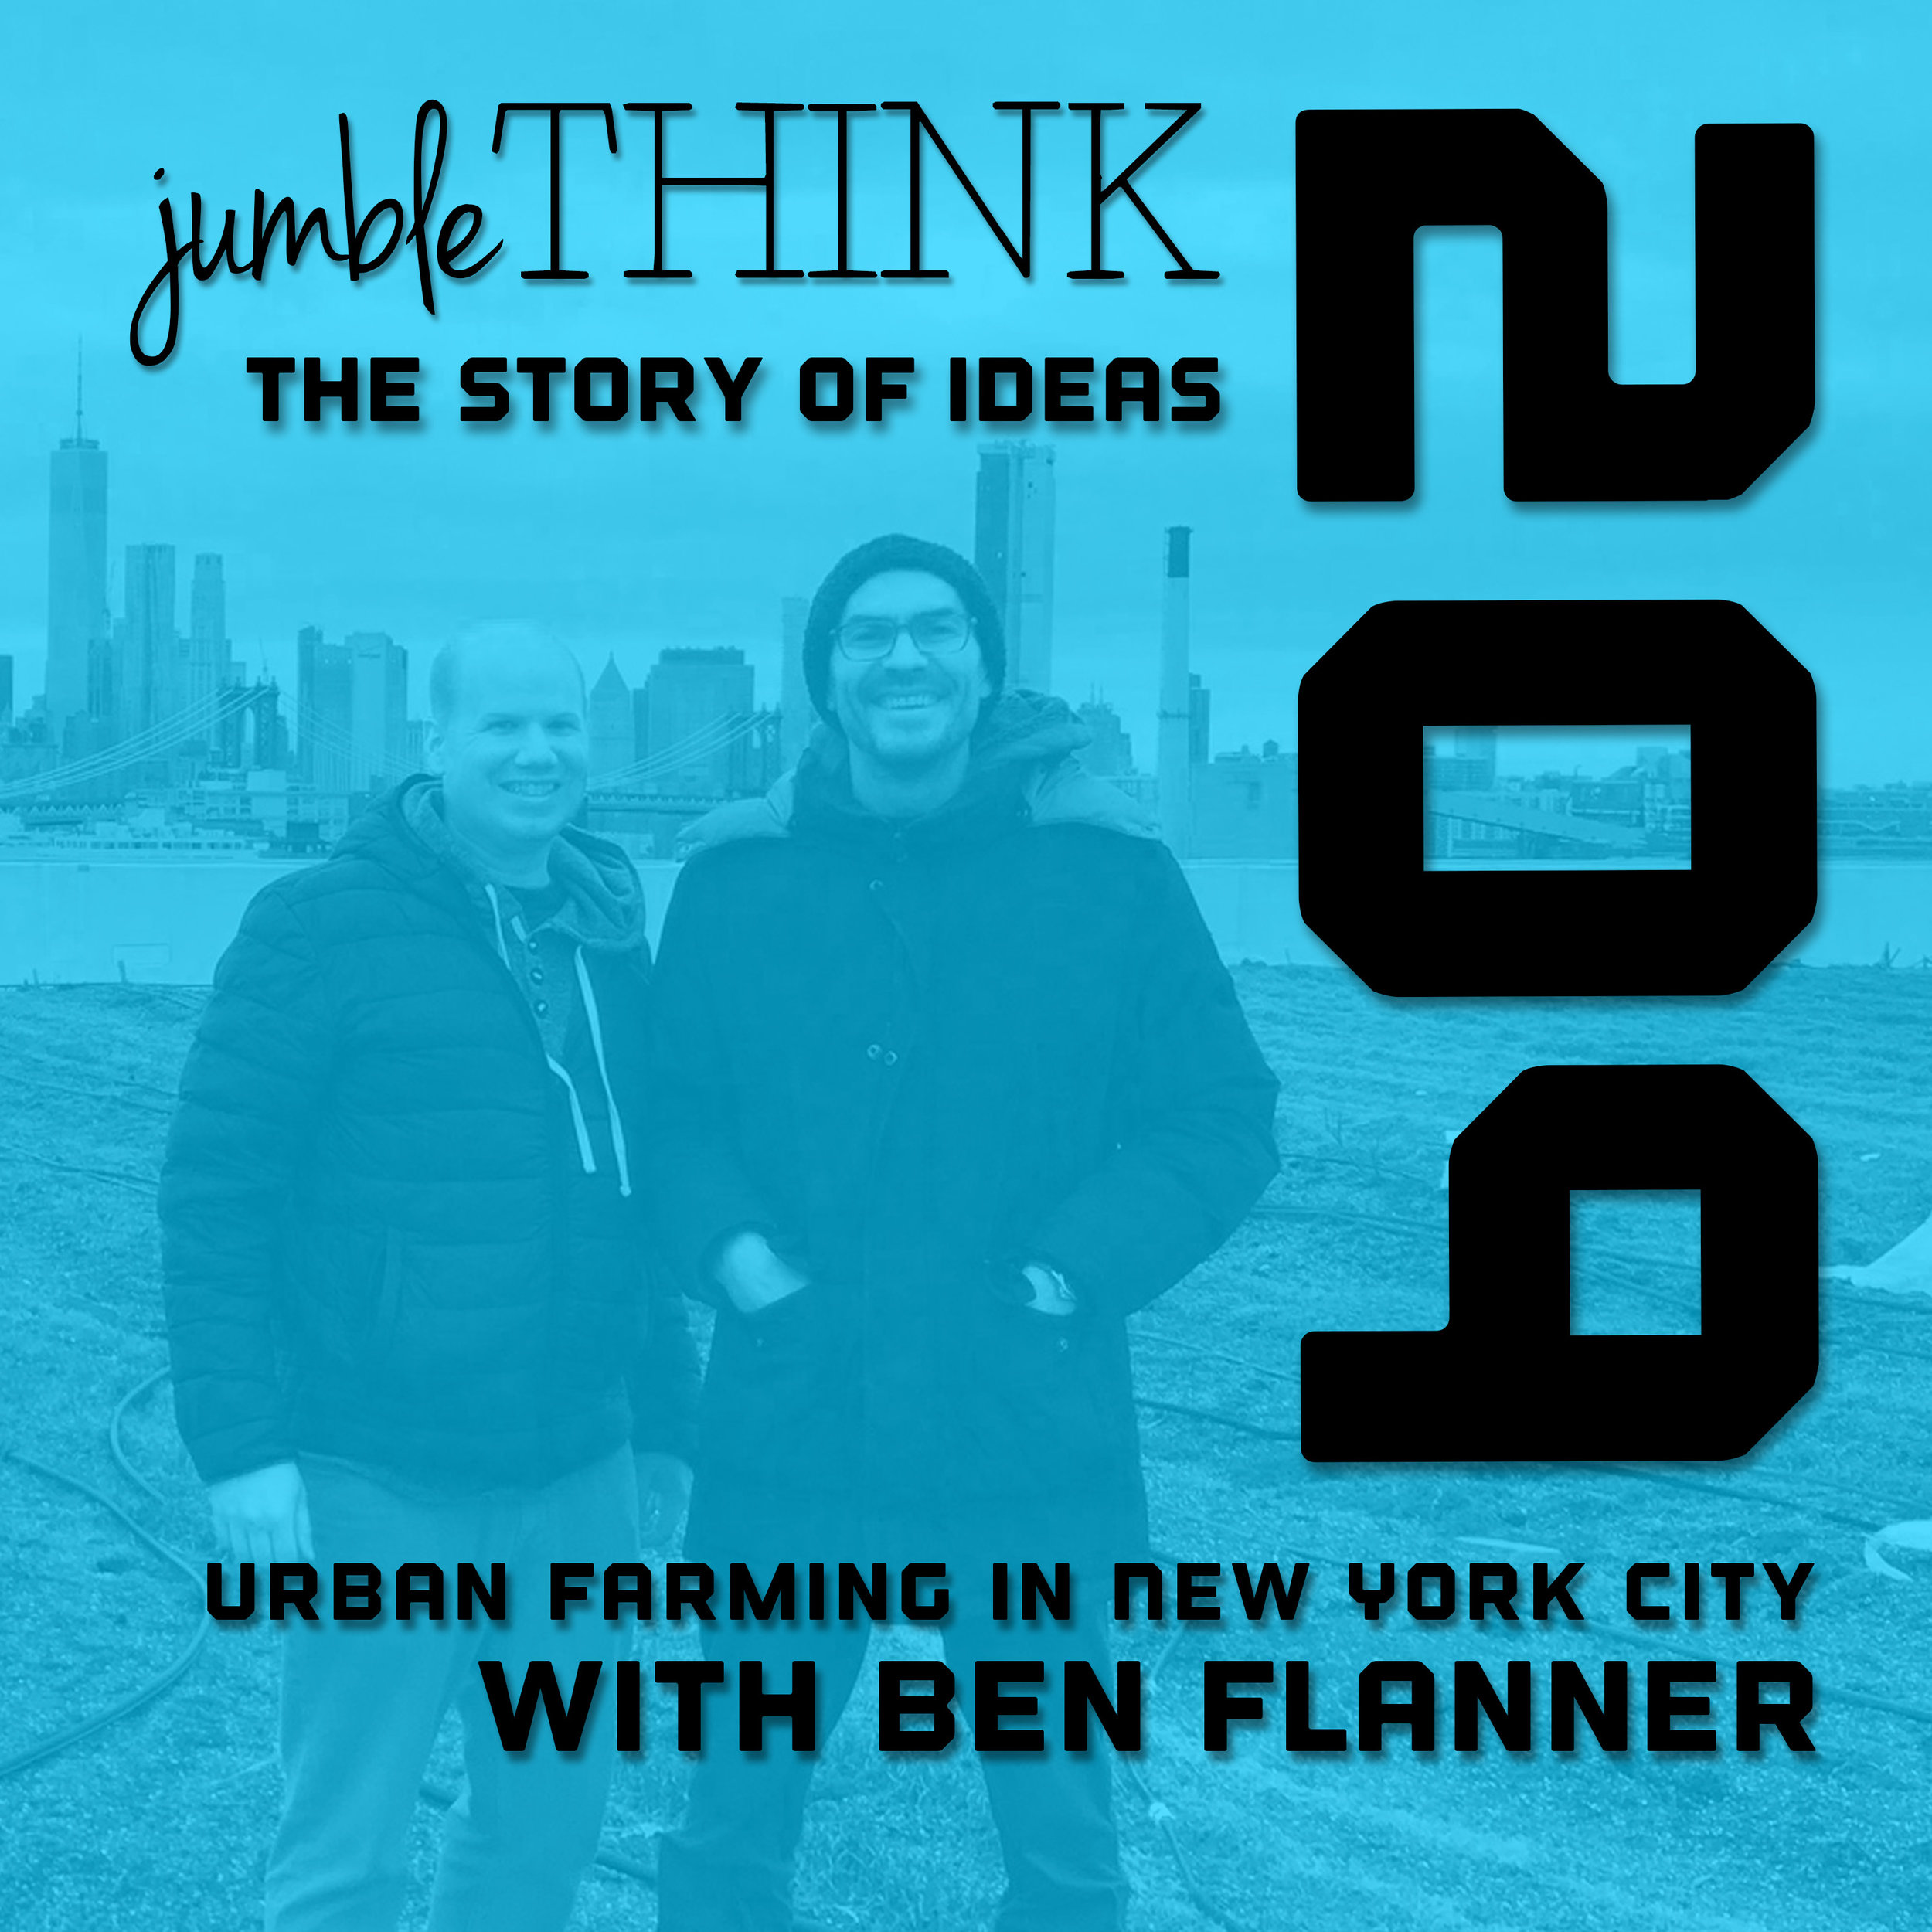 Urban Farming in New York City